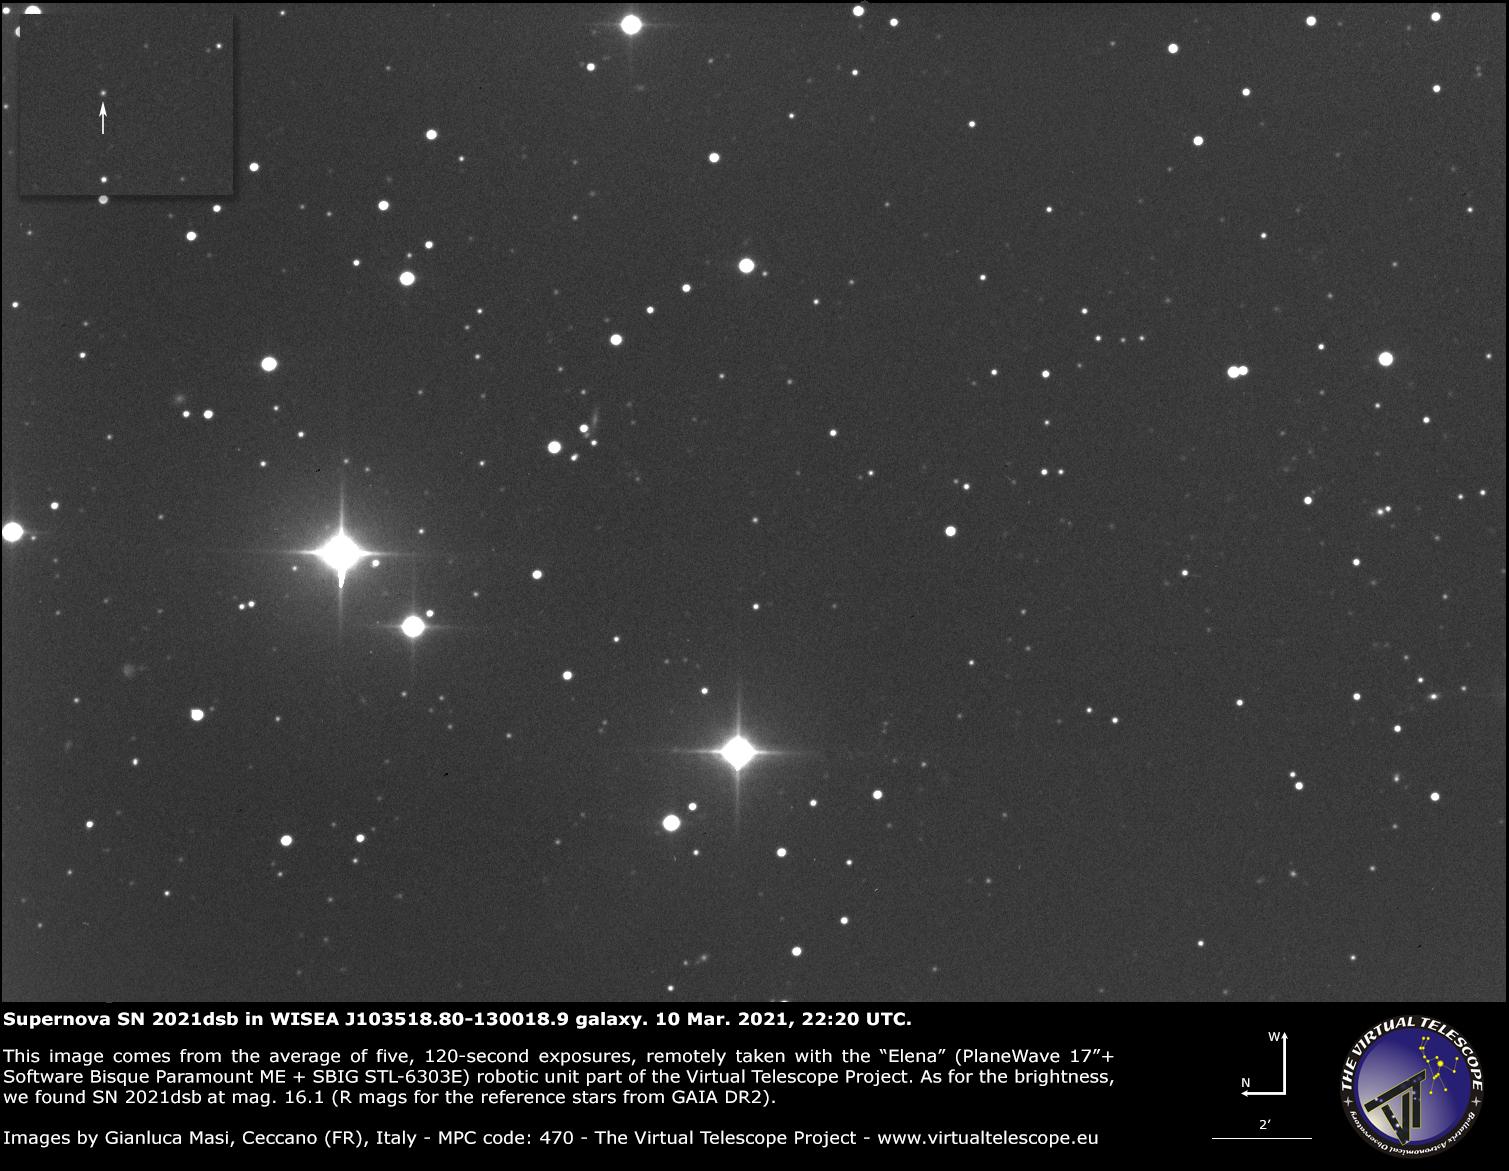 Supernova SN 2021dsb in WISEA J103518.80-130018.9 galaxy: 10 Mar. 2021.